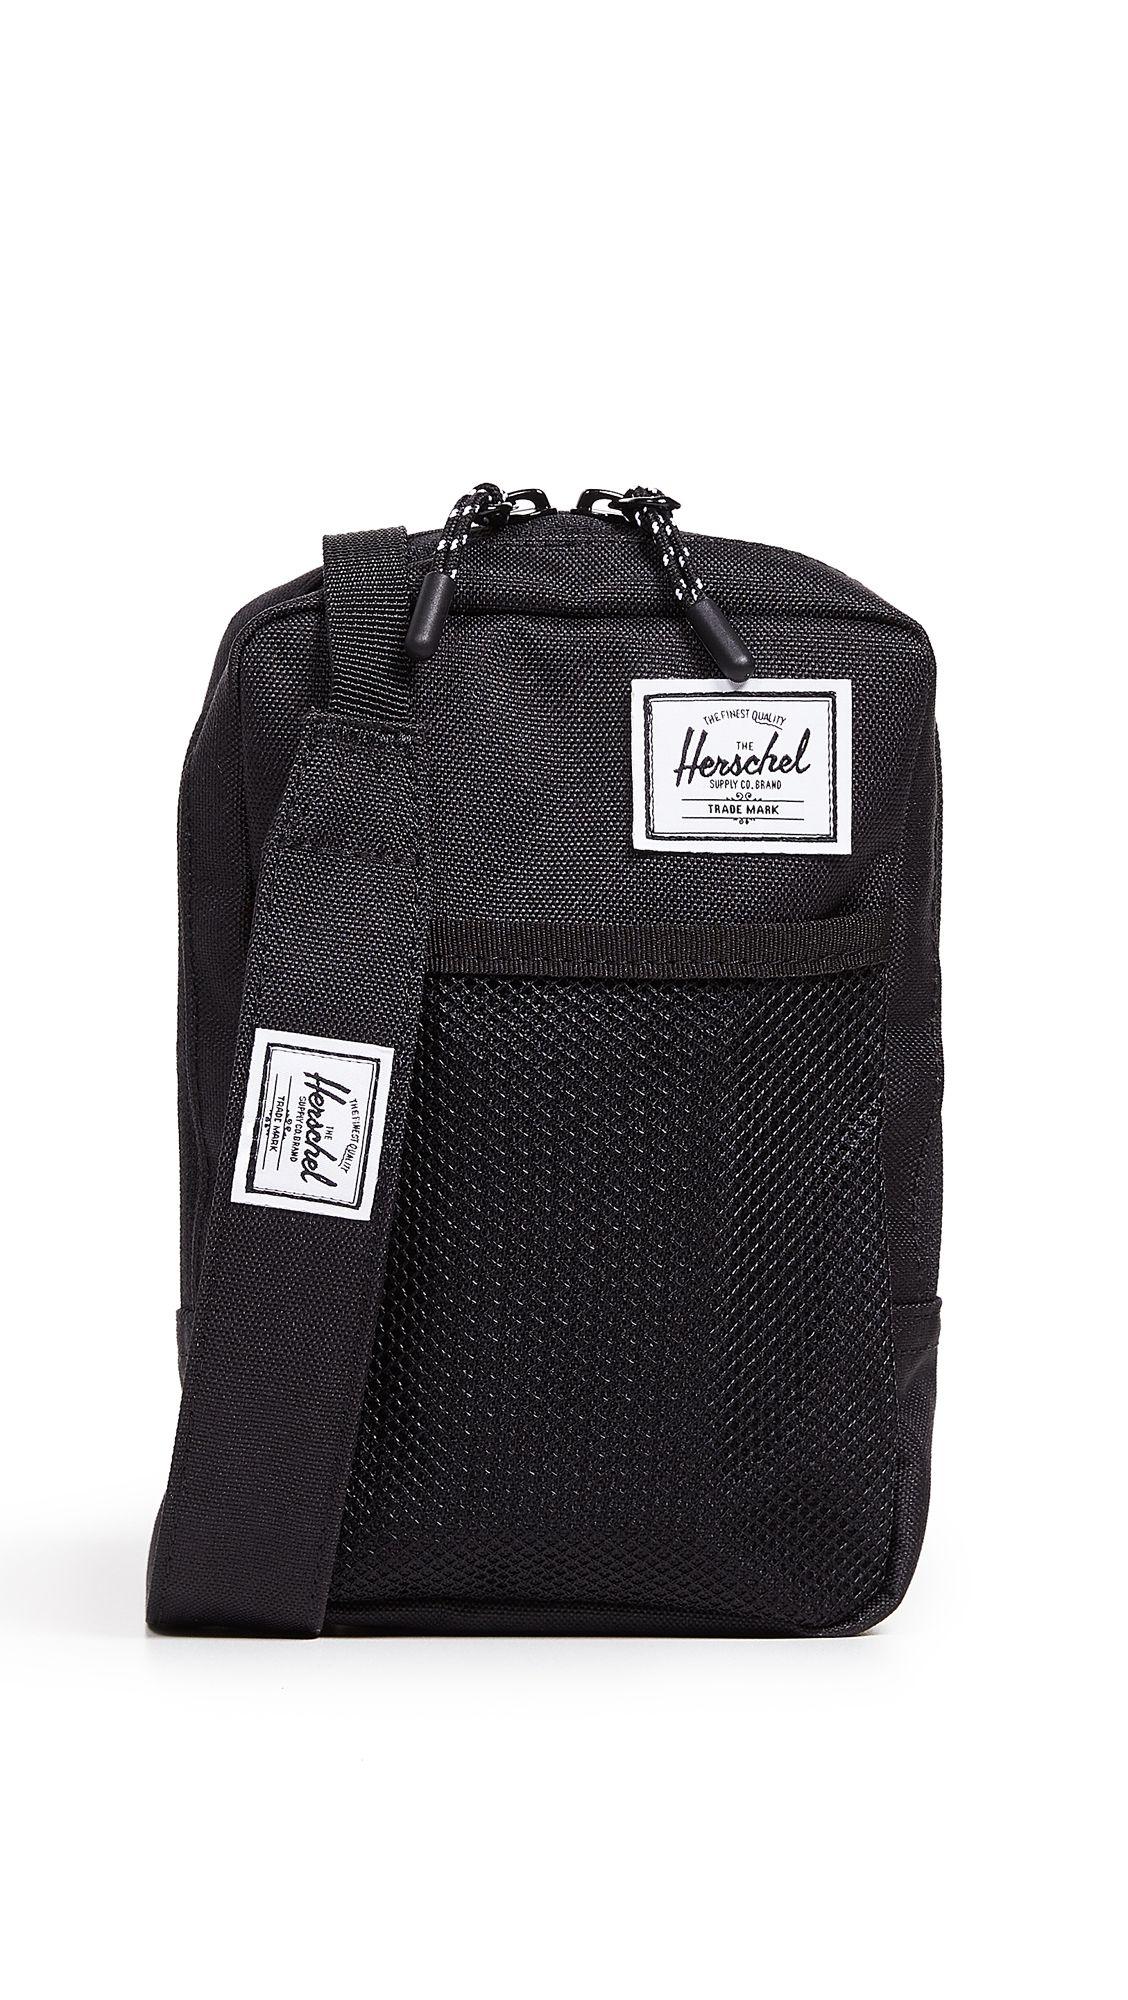 ef967f308e8 HERSCHEL SUPPLY CO. SINCLAIR BAG.  herschelsupplyco.  bags  shoulder bags   canvas